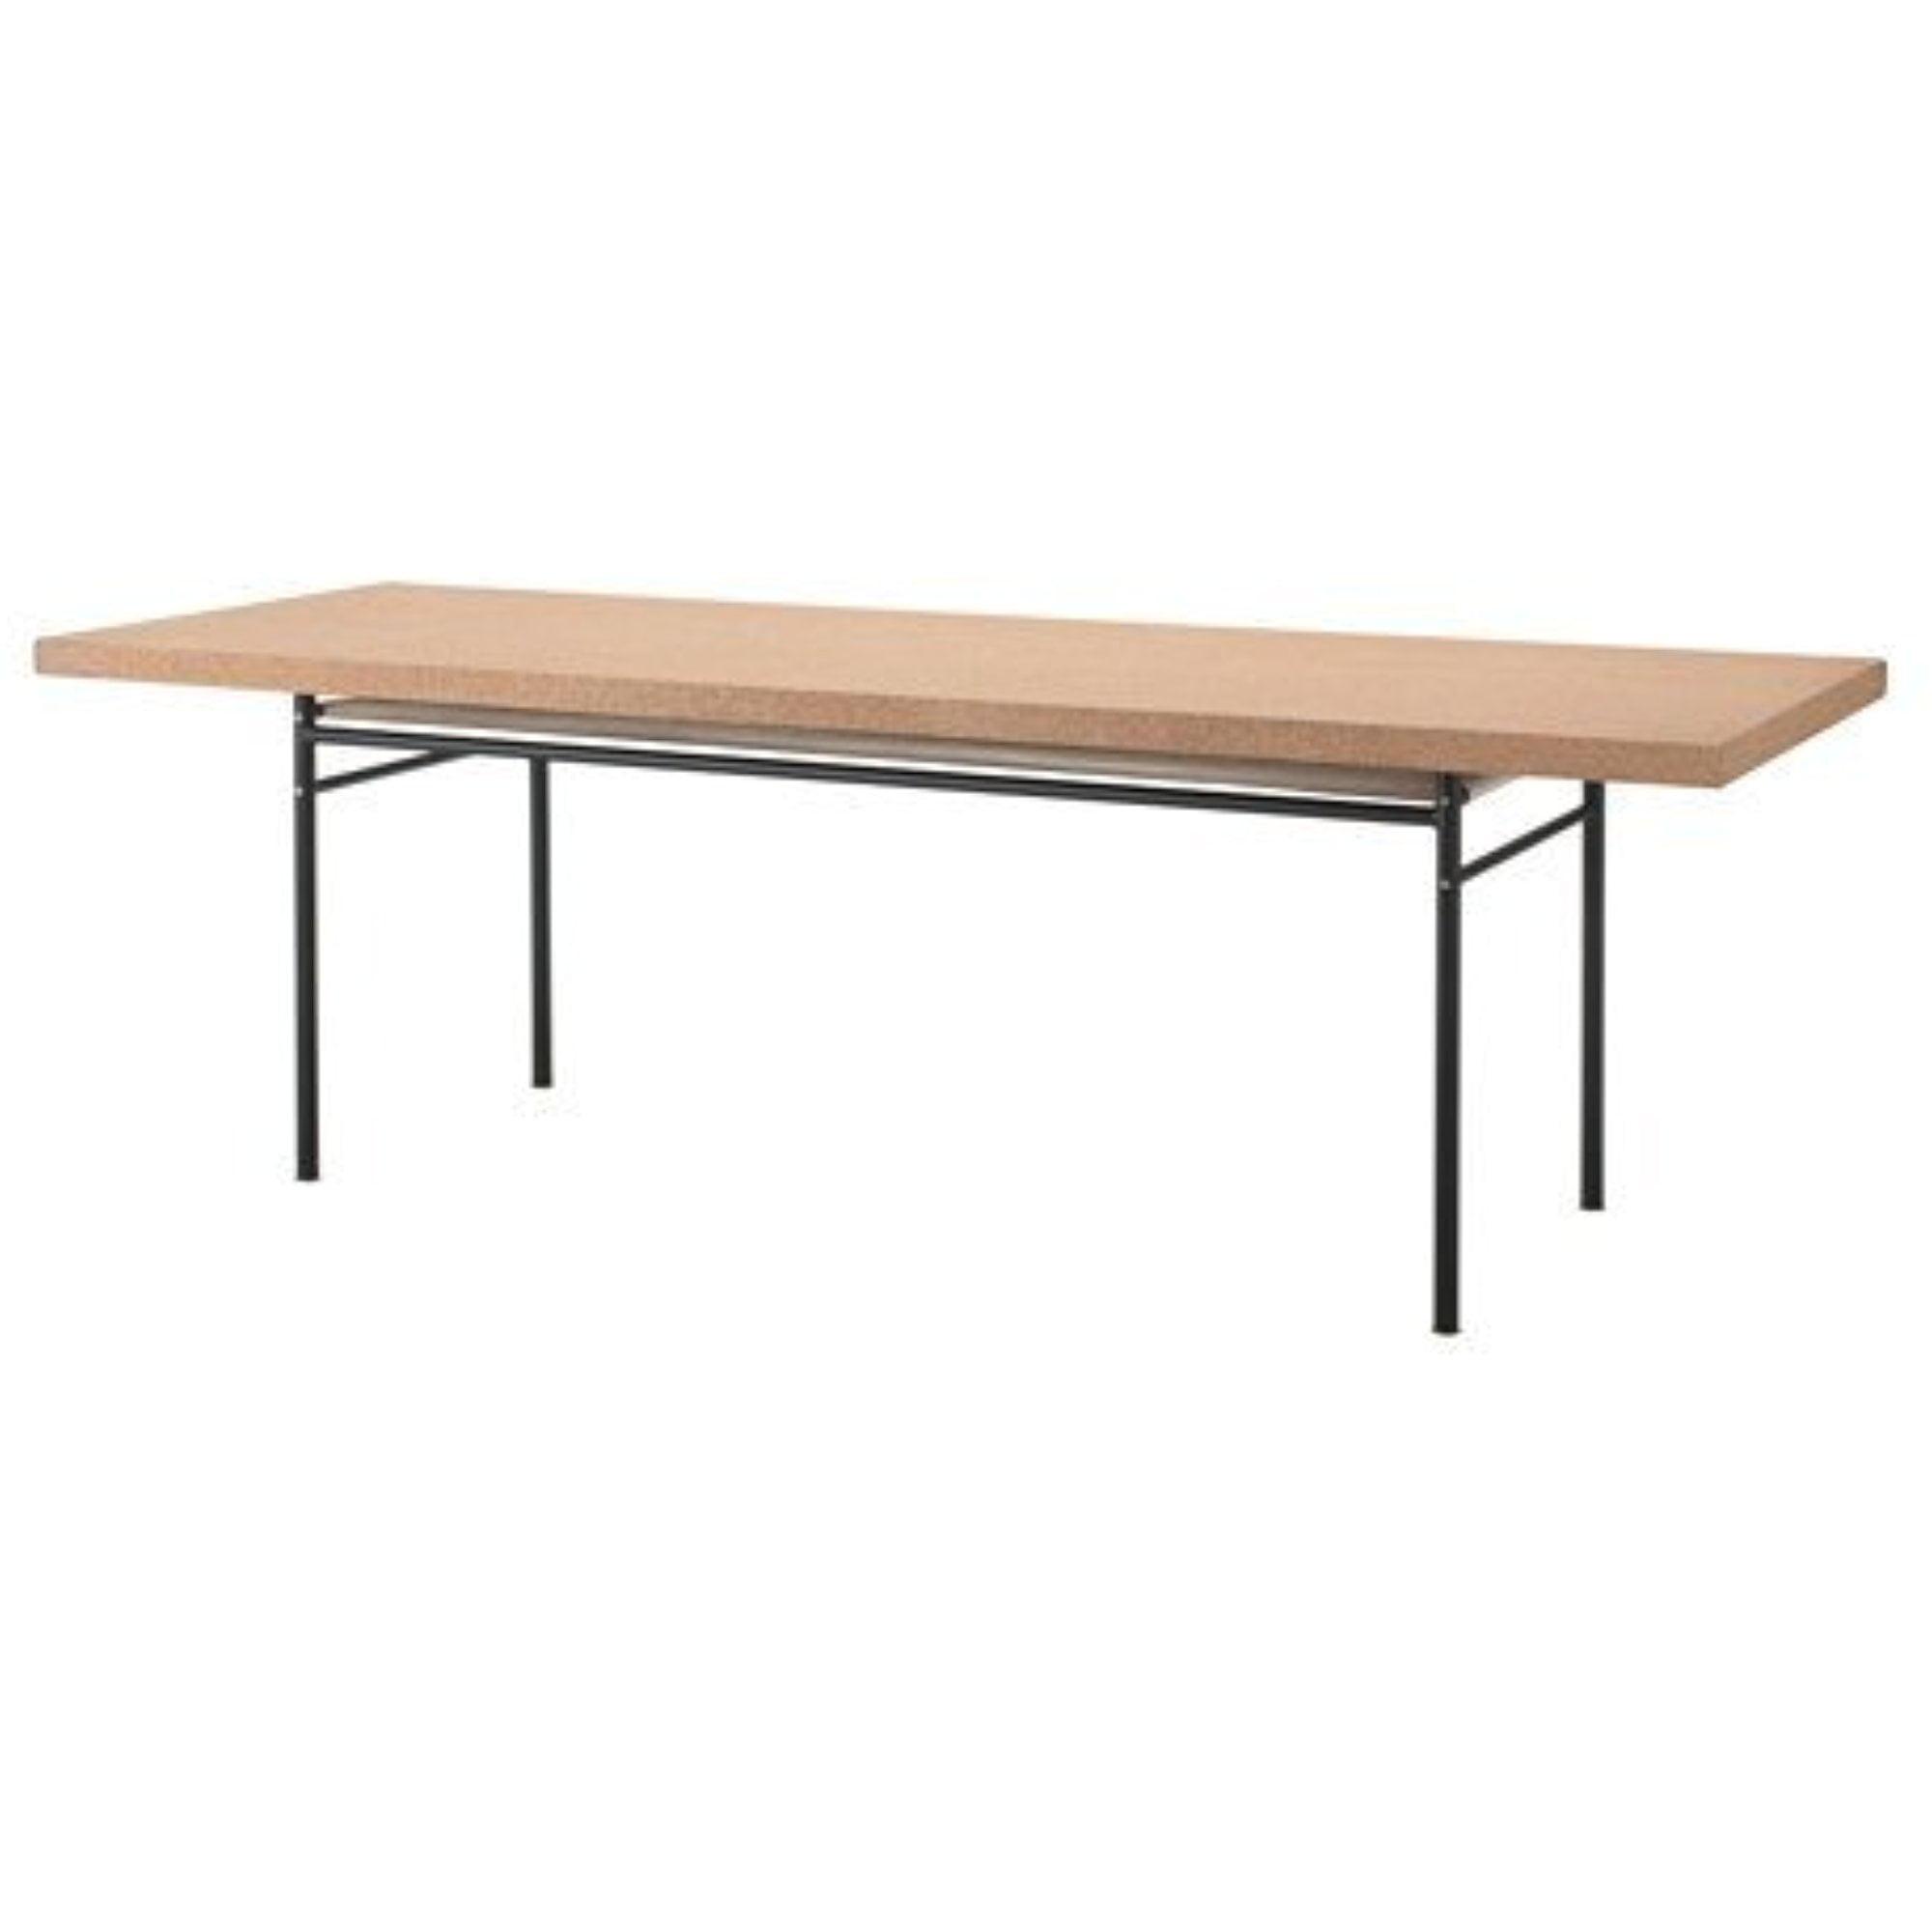 Ikea Dining Table Cork Natural 628 21723 3018 Walmart Com Walmart Com